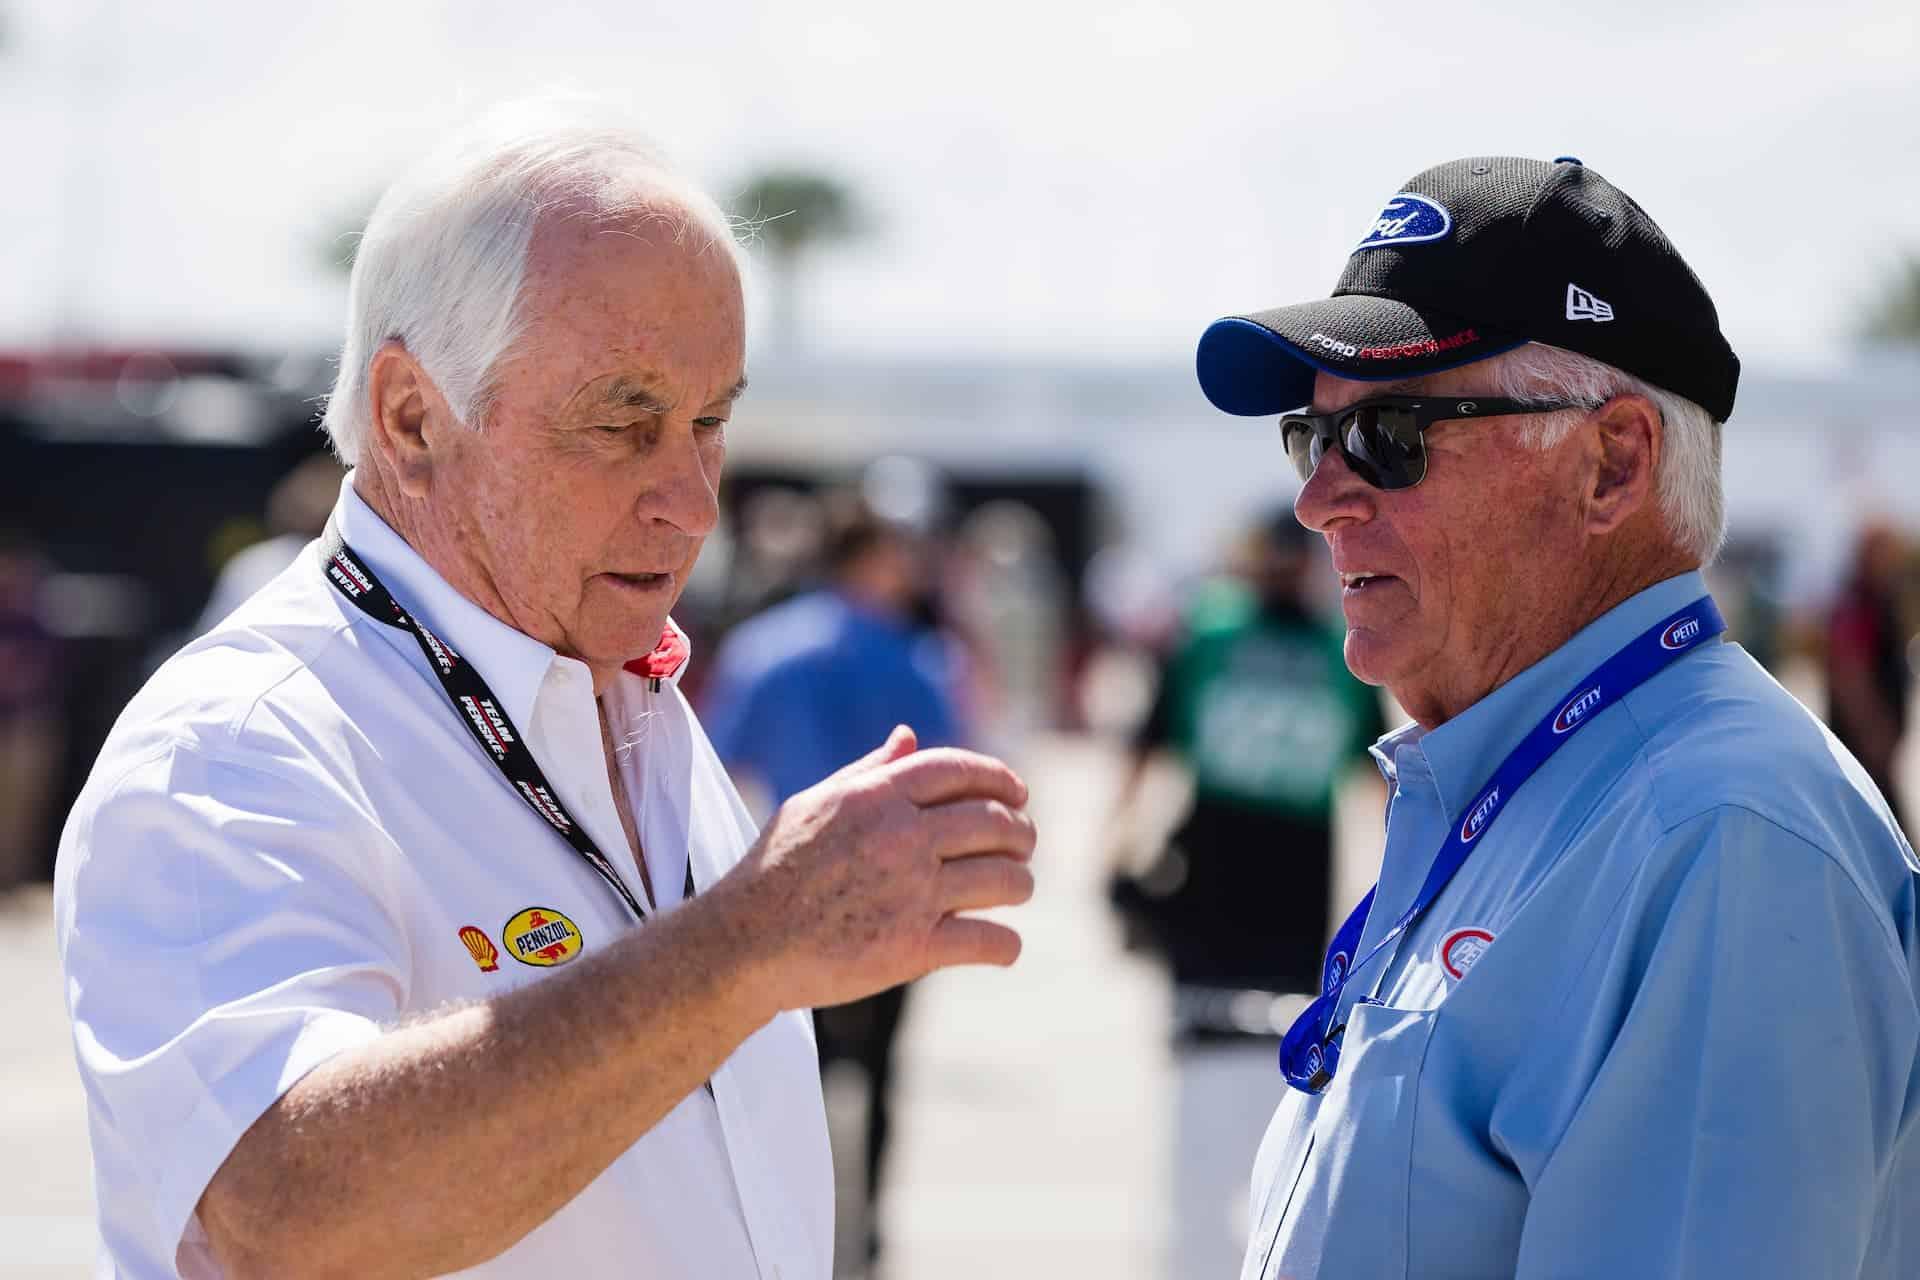 Roger Penske and Dale Inman talk at Daytona International Speedway in 2017. Photo by Nigel Kinrade Photography.